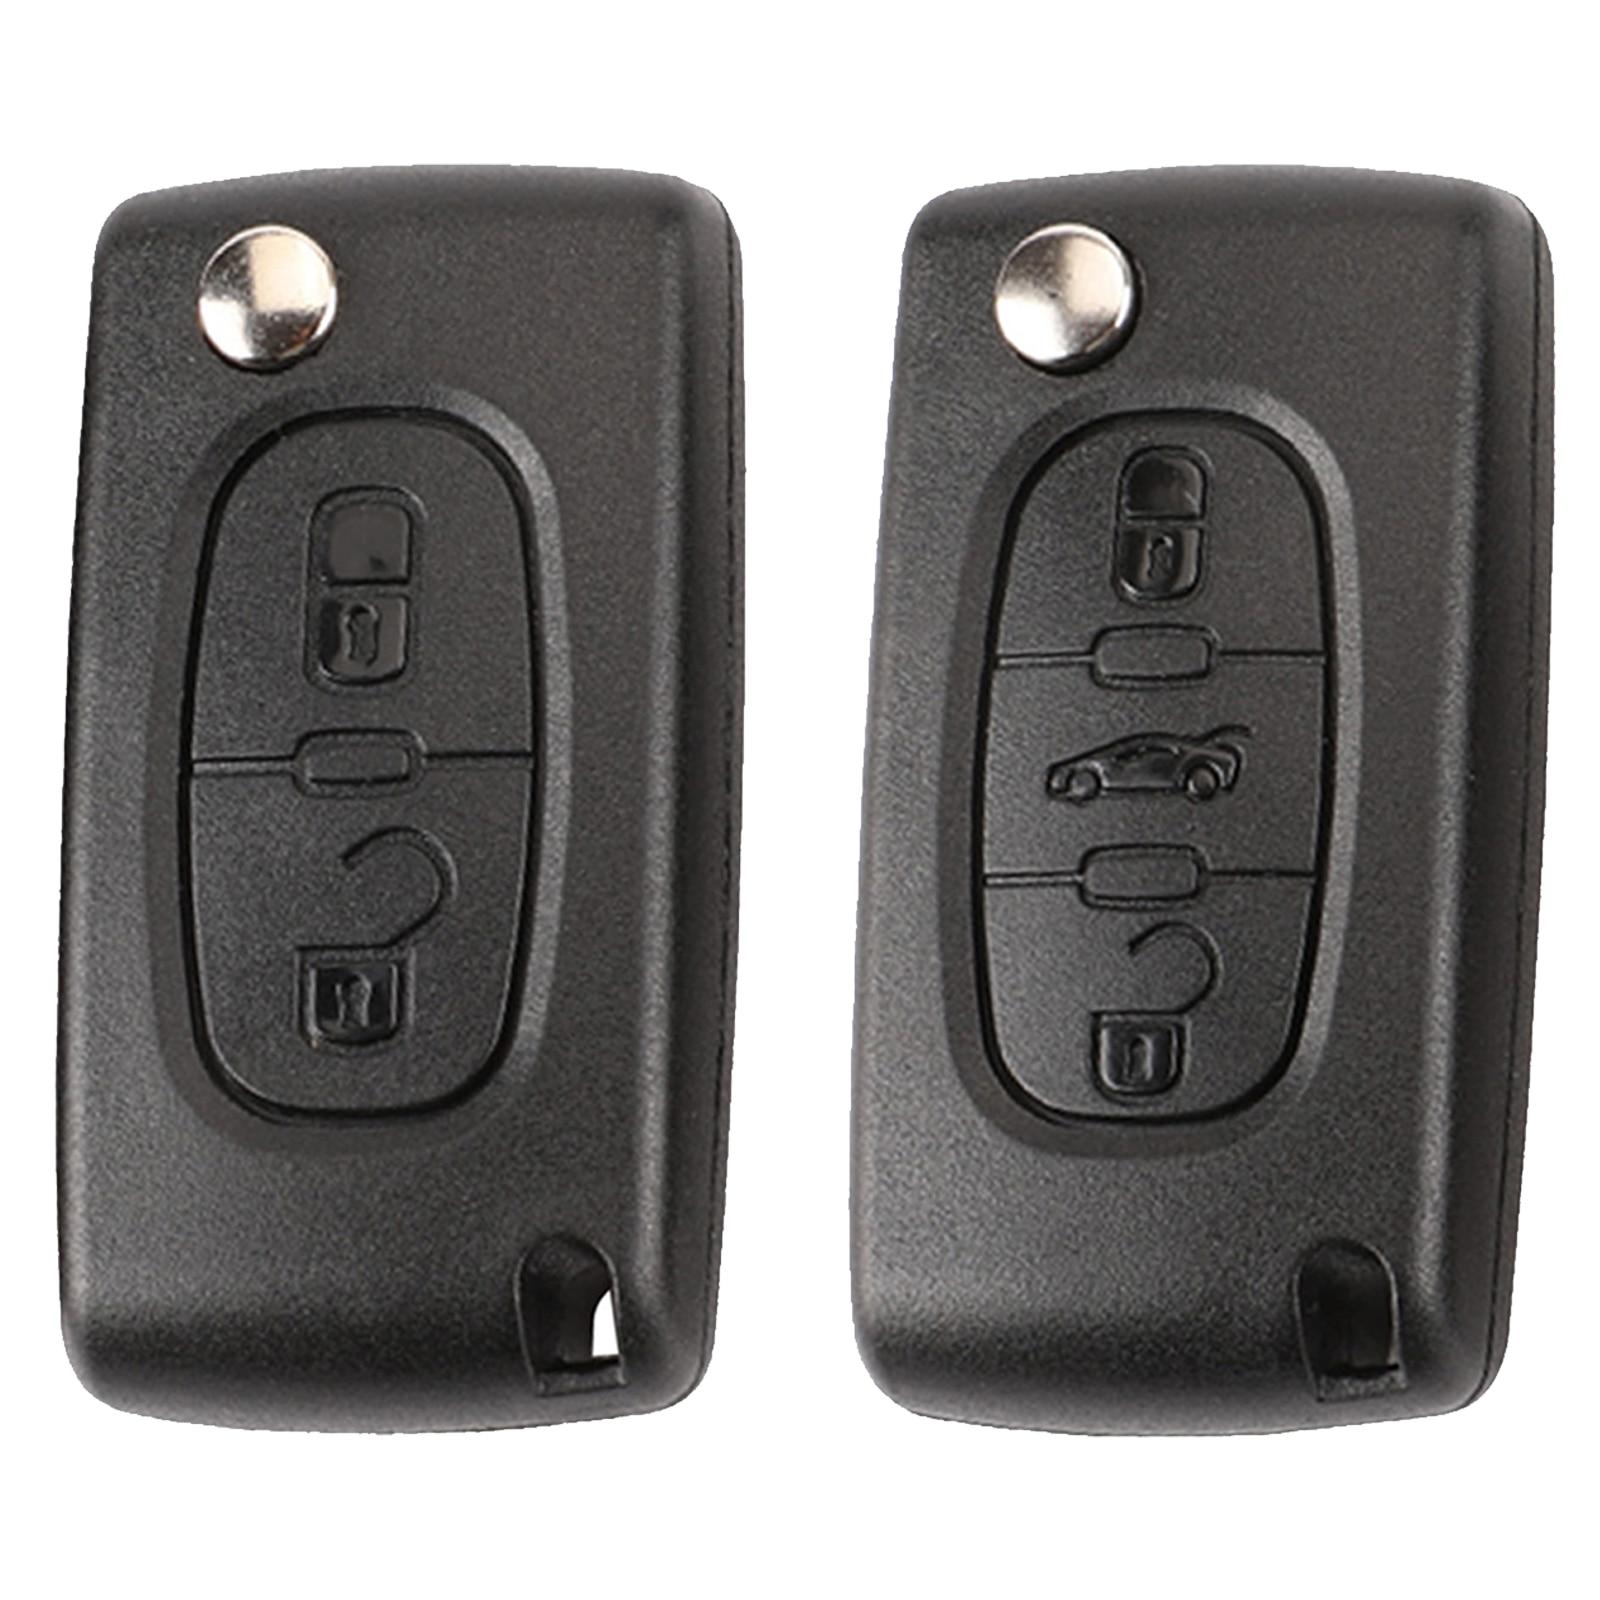 2 BTN HCA/VA2 Remote Flip Car Key Shell for Peugeot 207 307 308 407 408 607 Citroen C2 C3 C4 C5 C6 C8 Xsara Picasso CE0523/CE5362 BTN HCA/VA2 Remote Flip Car Key Shell for Peugeot 207 307 308 407 408 607 Citroen C2 C3 C4 C5 C6 C8 Xsara Picasso CE0523/CE536